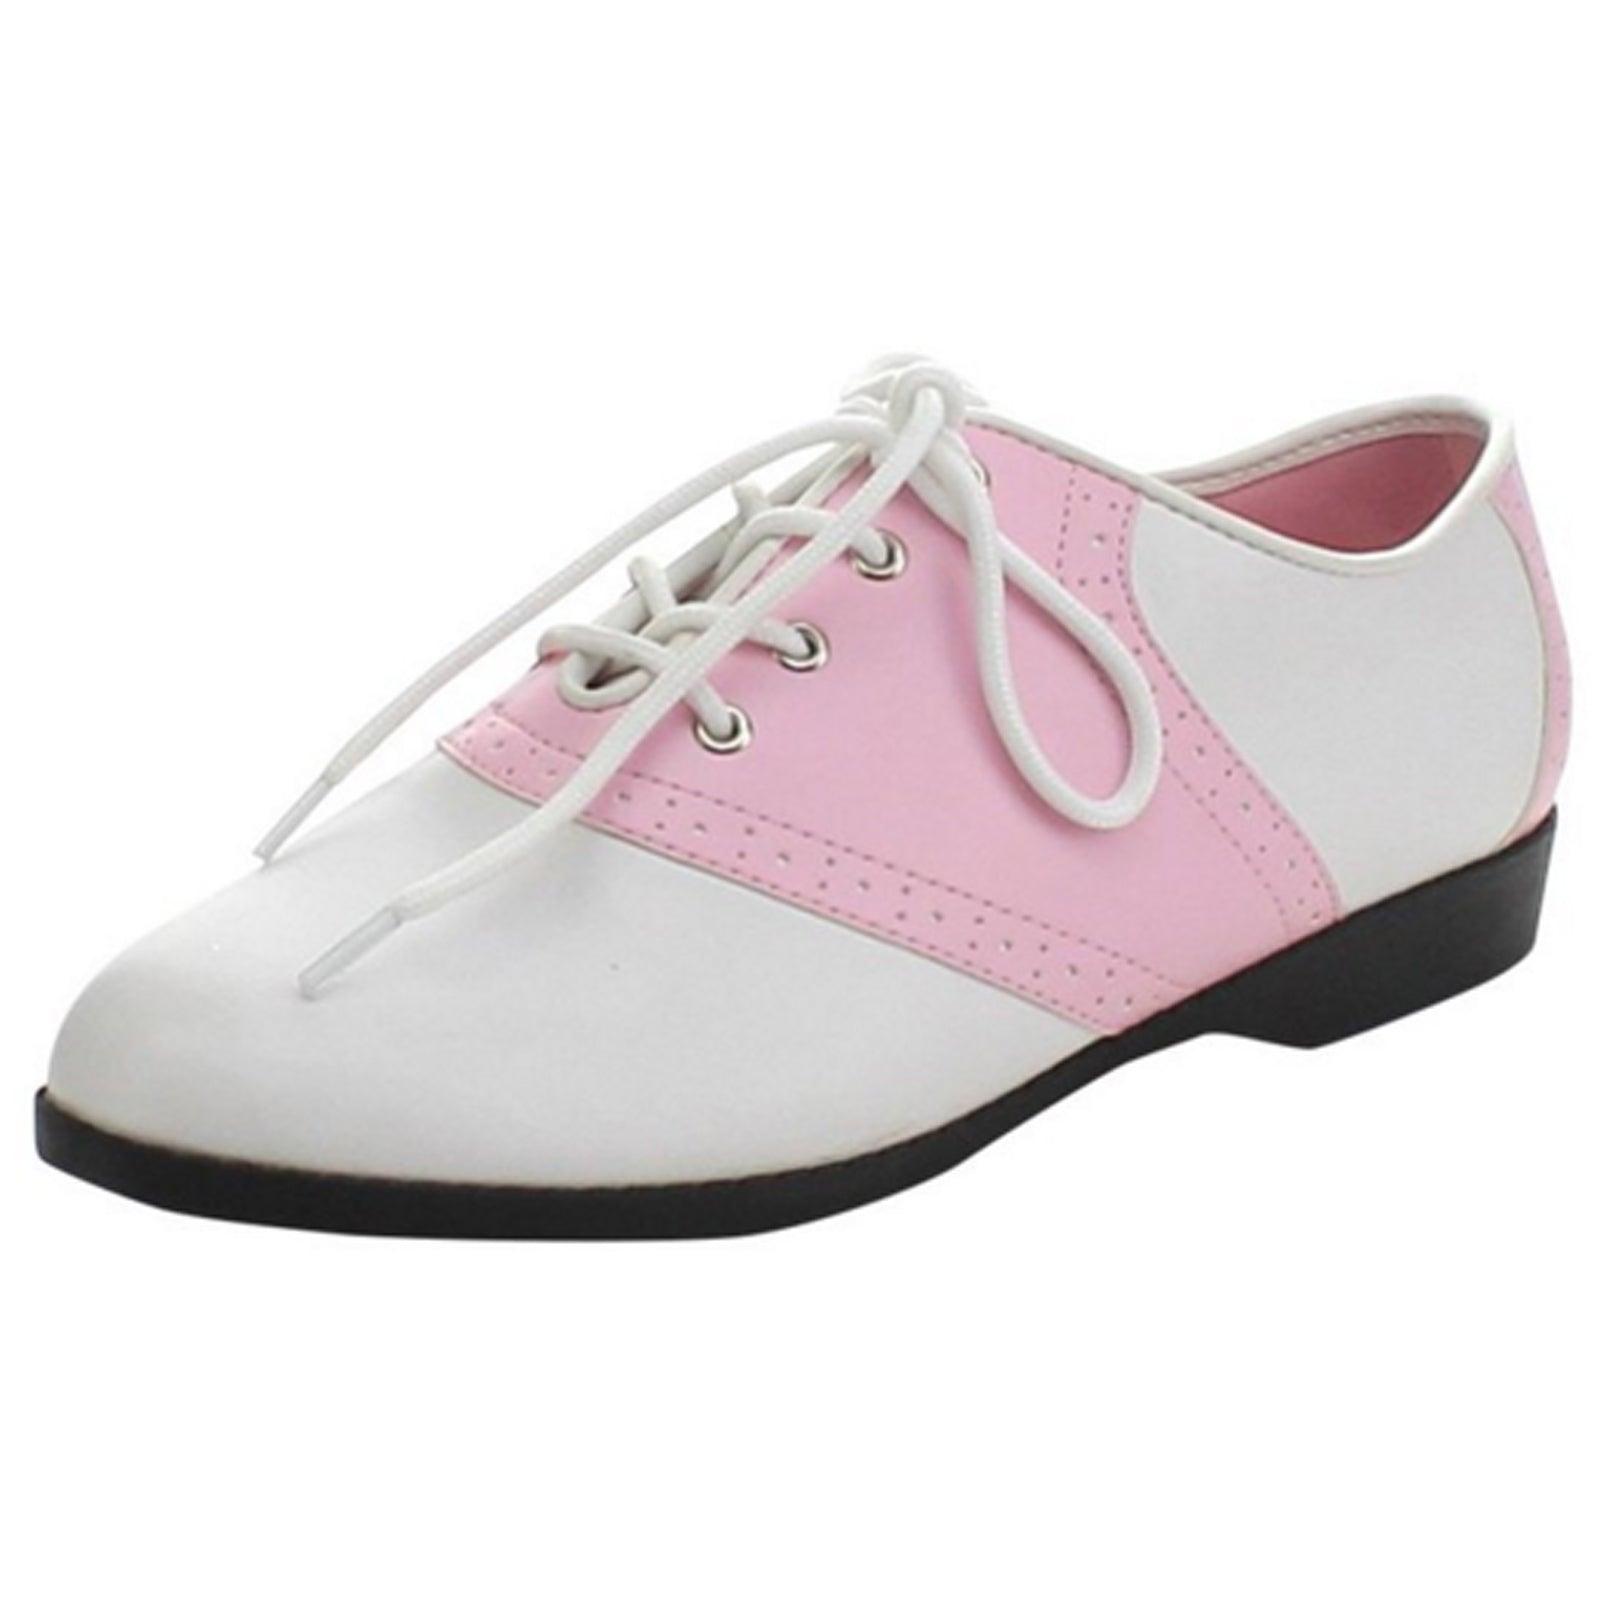 Funtasma SADDLE-50 Women/'s Shoes Black-White Pu Lace Up Oxford Casual Flat